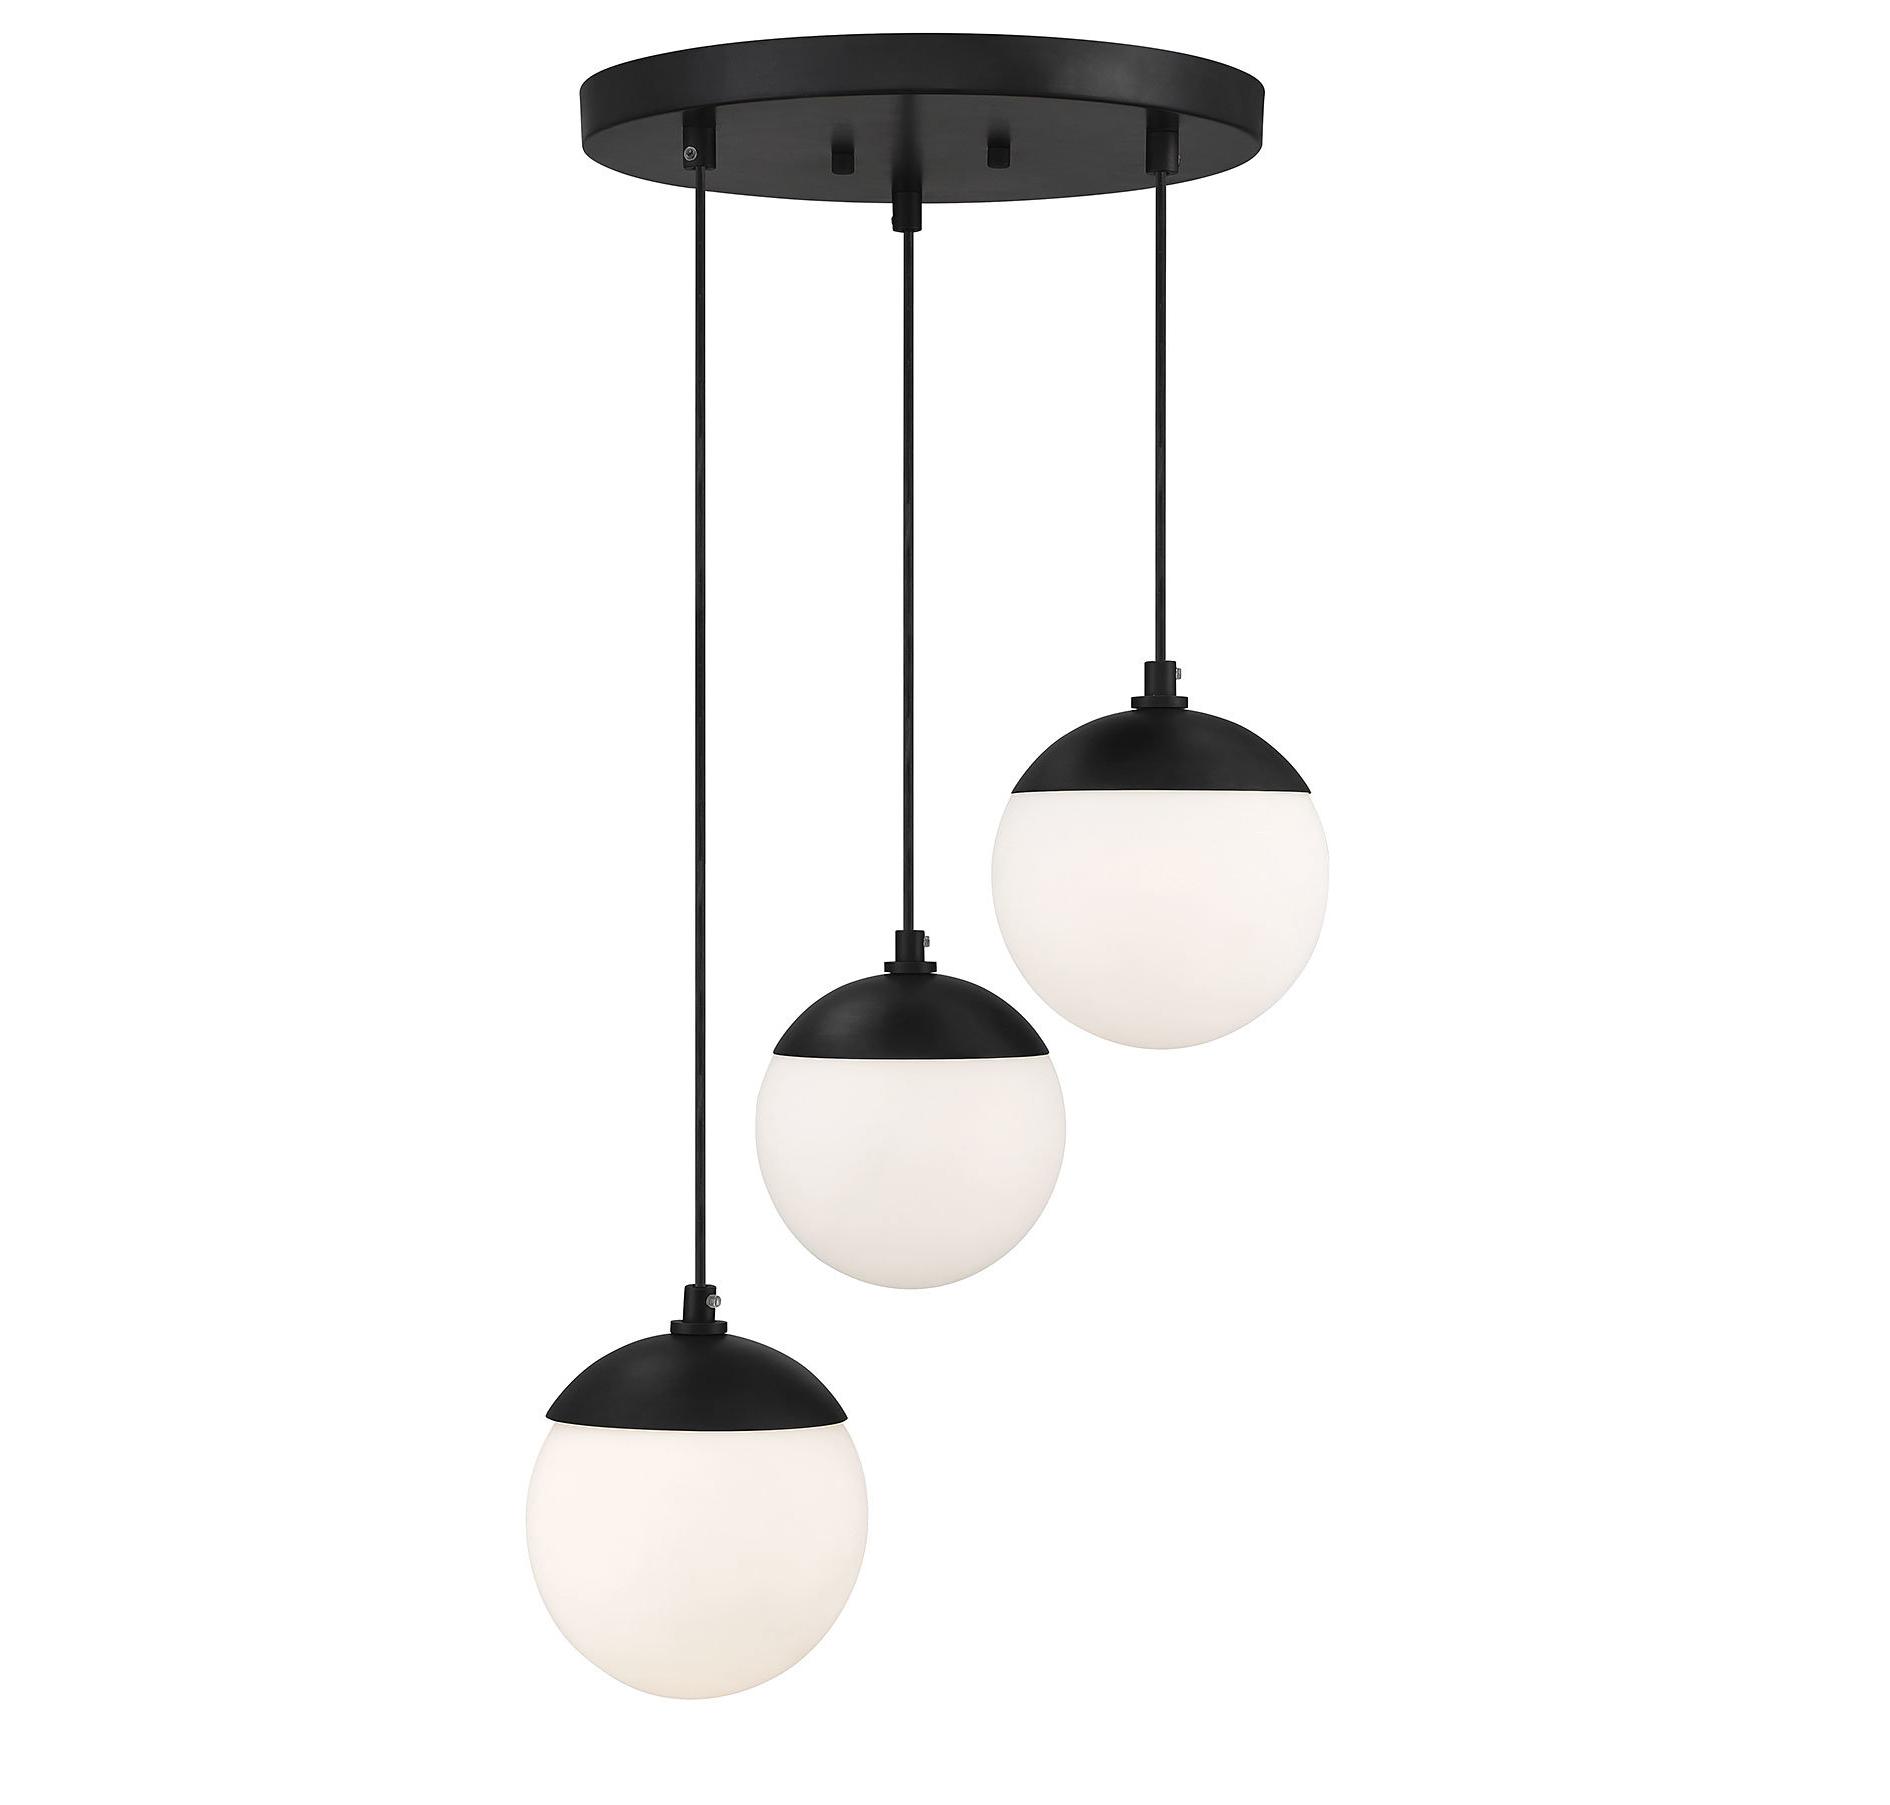 Bautista 1 Light Single Globe Pendants With Regard To 2020 Kara 3 Light Cluster Globe Pendant (View 17 of 20)